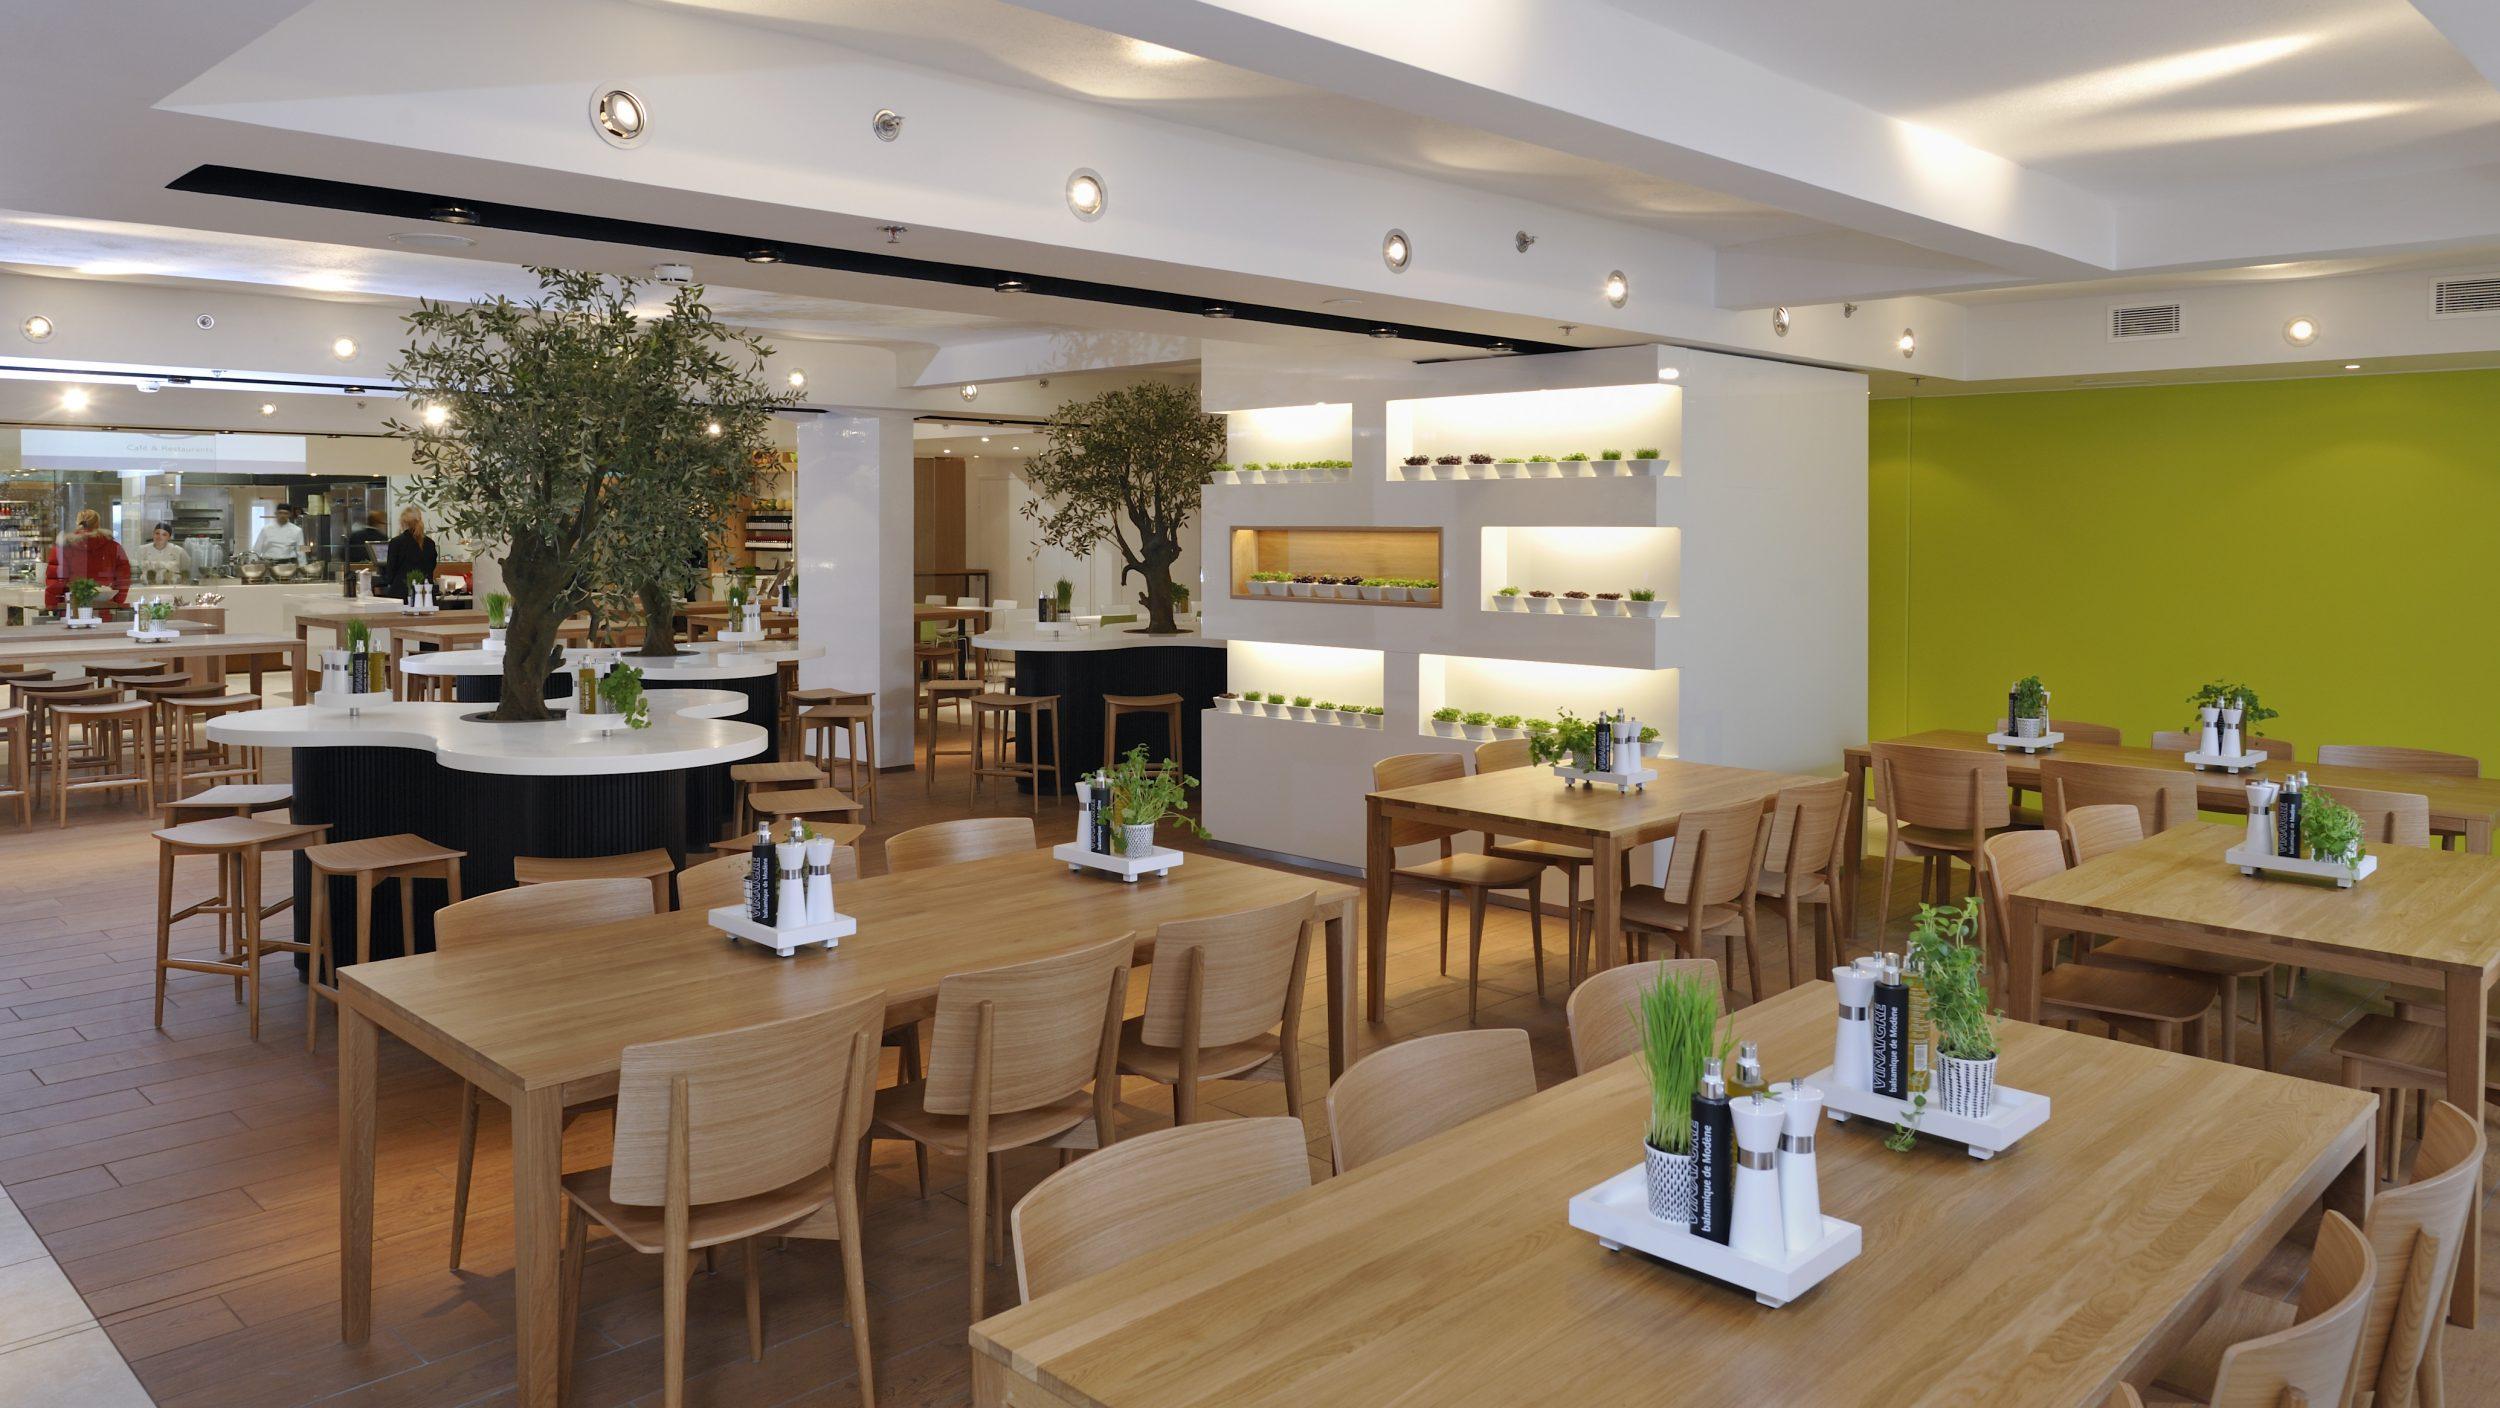 Fazer_Restaurant_F8_Helsinki_GI_project